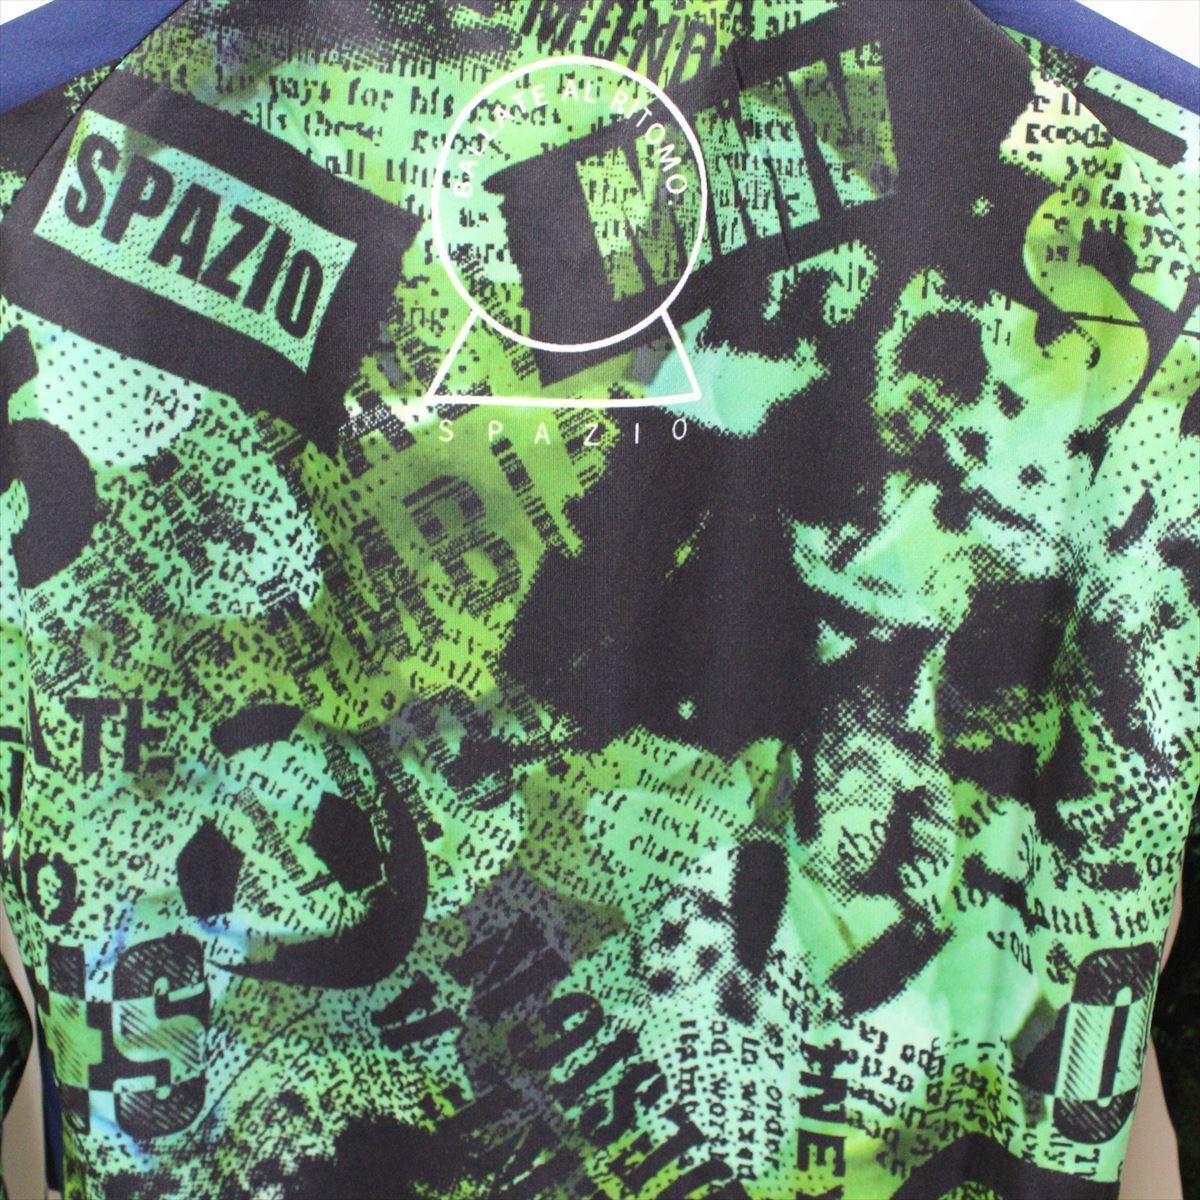 SPAZIO スパッツィオ メンズ長袖シャツ グリーン Oサイズ 新品 フットサル ロングスリーブ 吸水速乾 UVケア_画像5